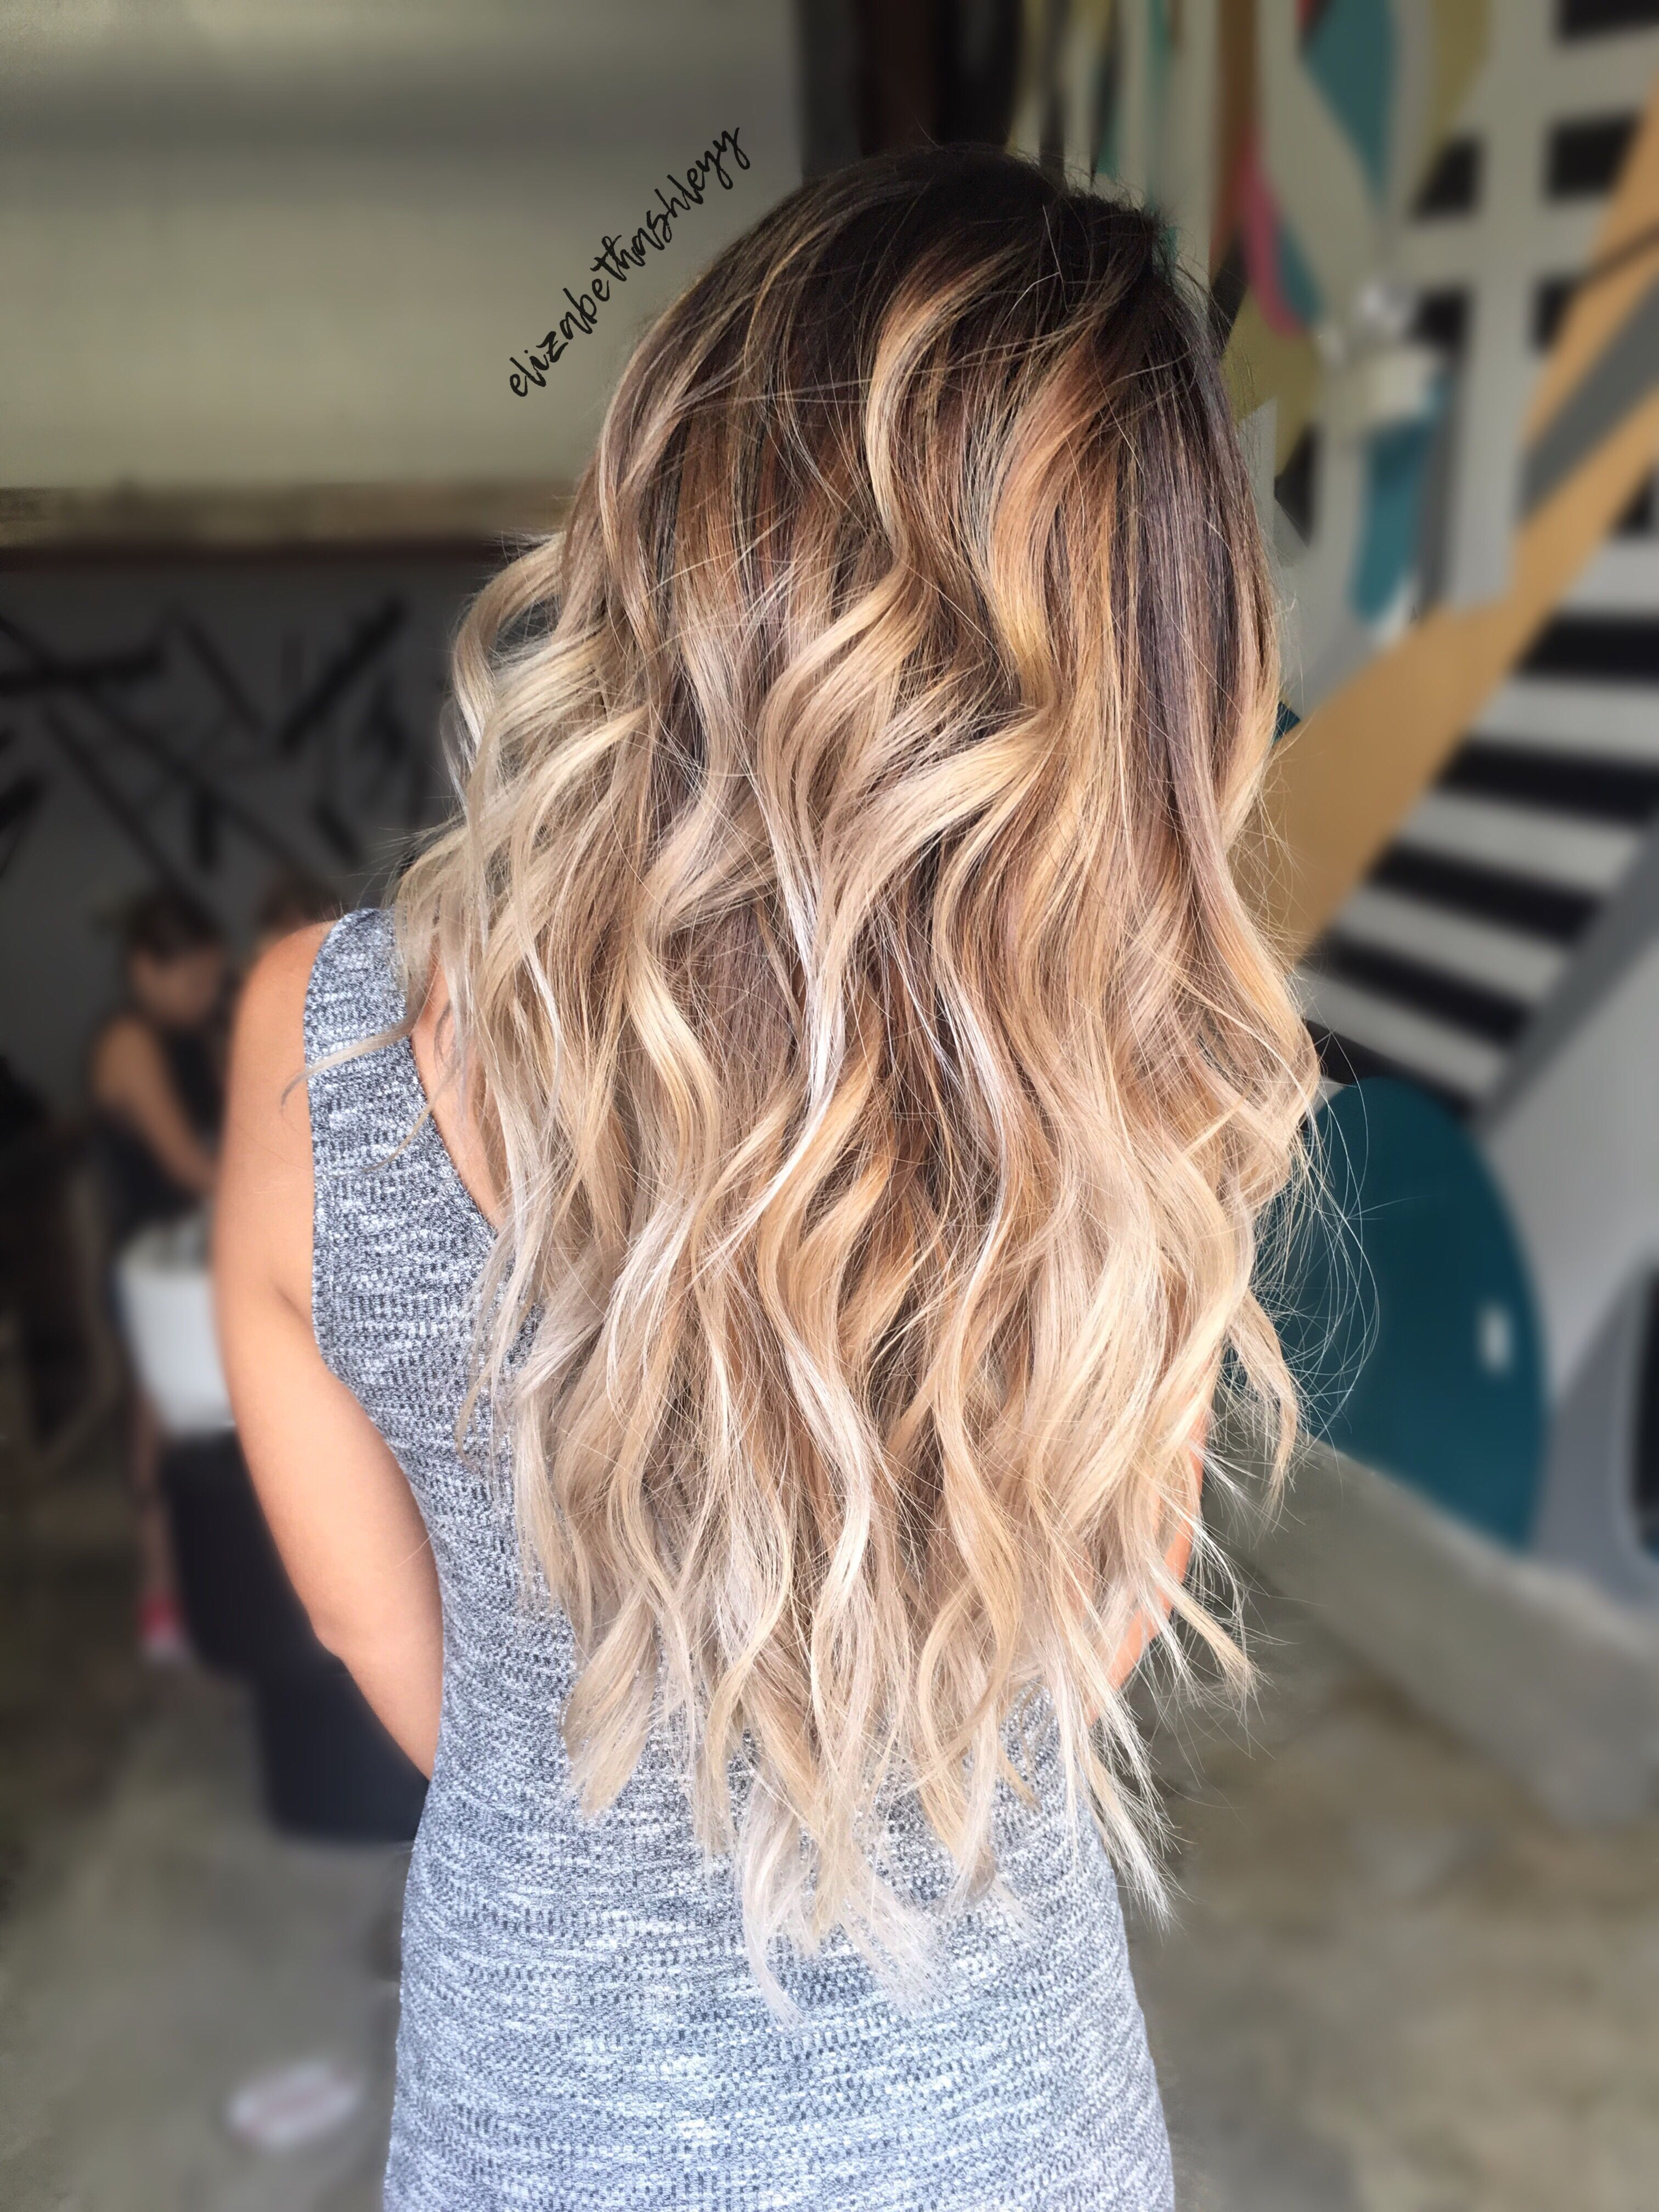 Iced Macchiato Hair Balayage Balayage Ombre Brown To Blonde